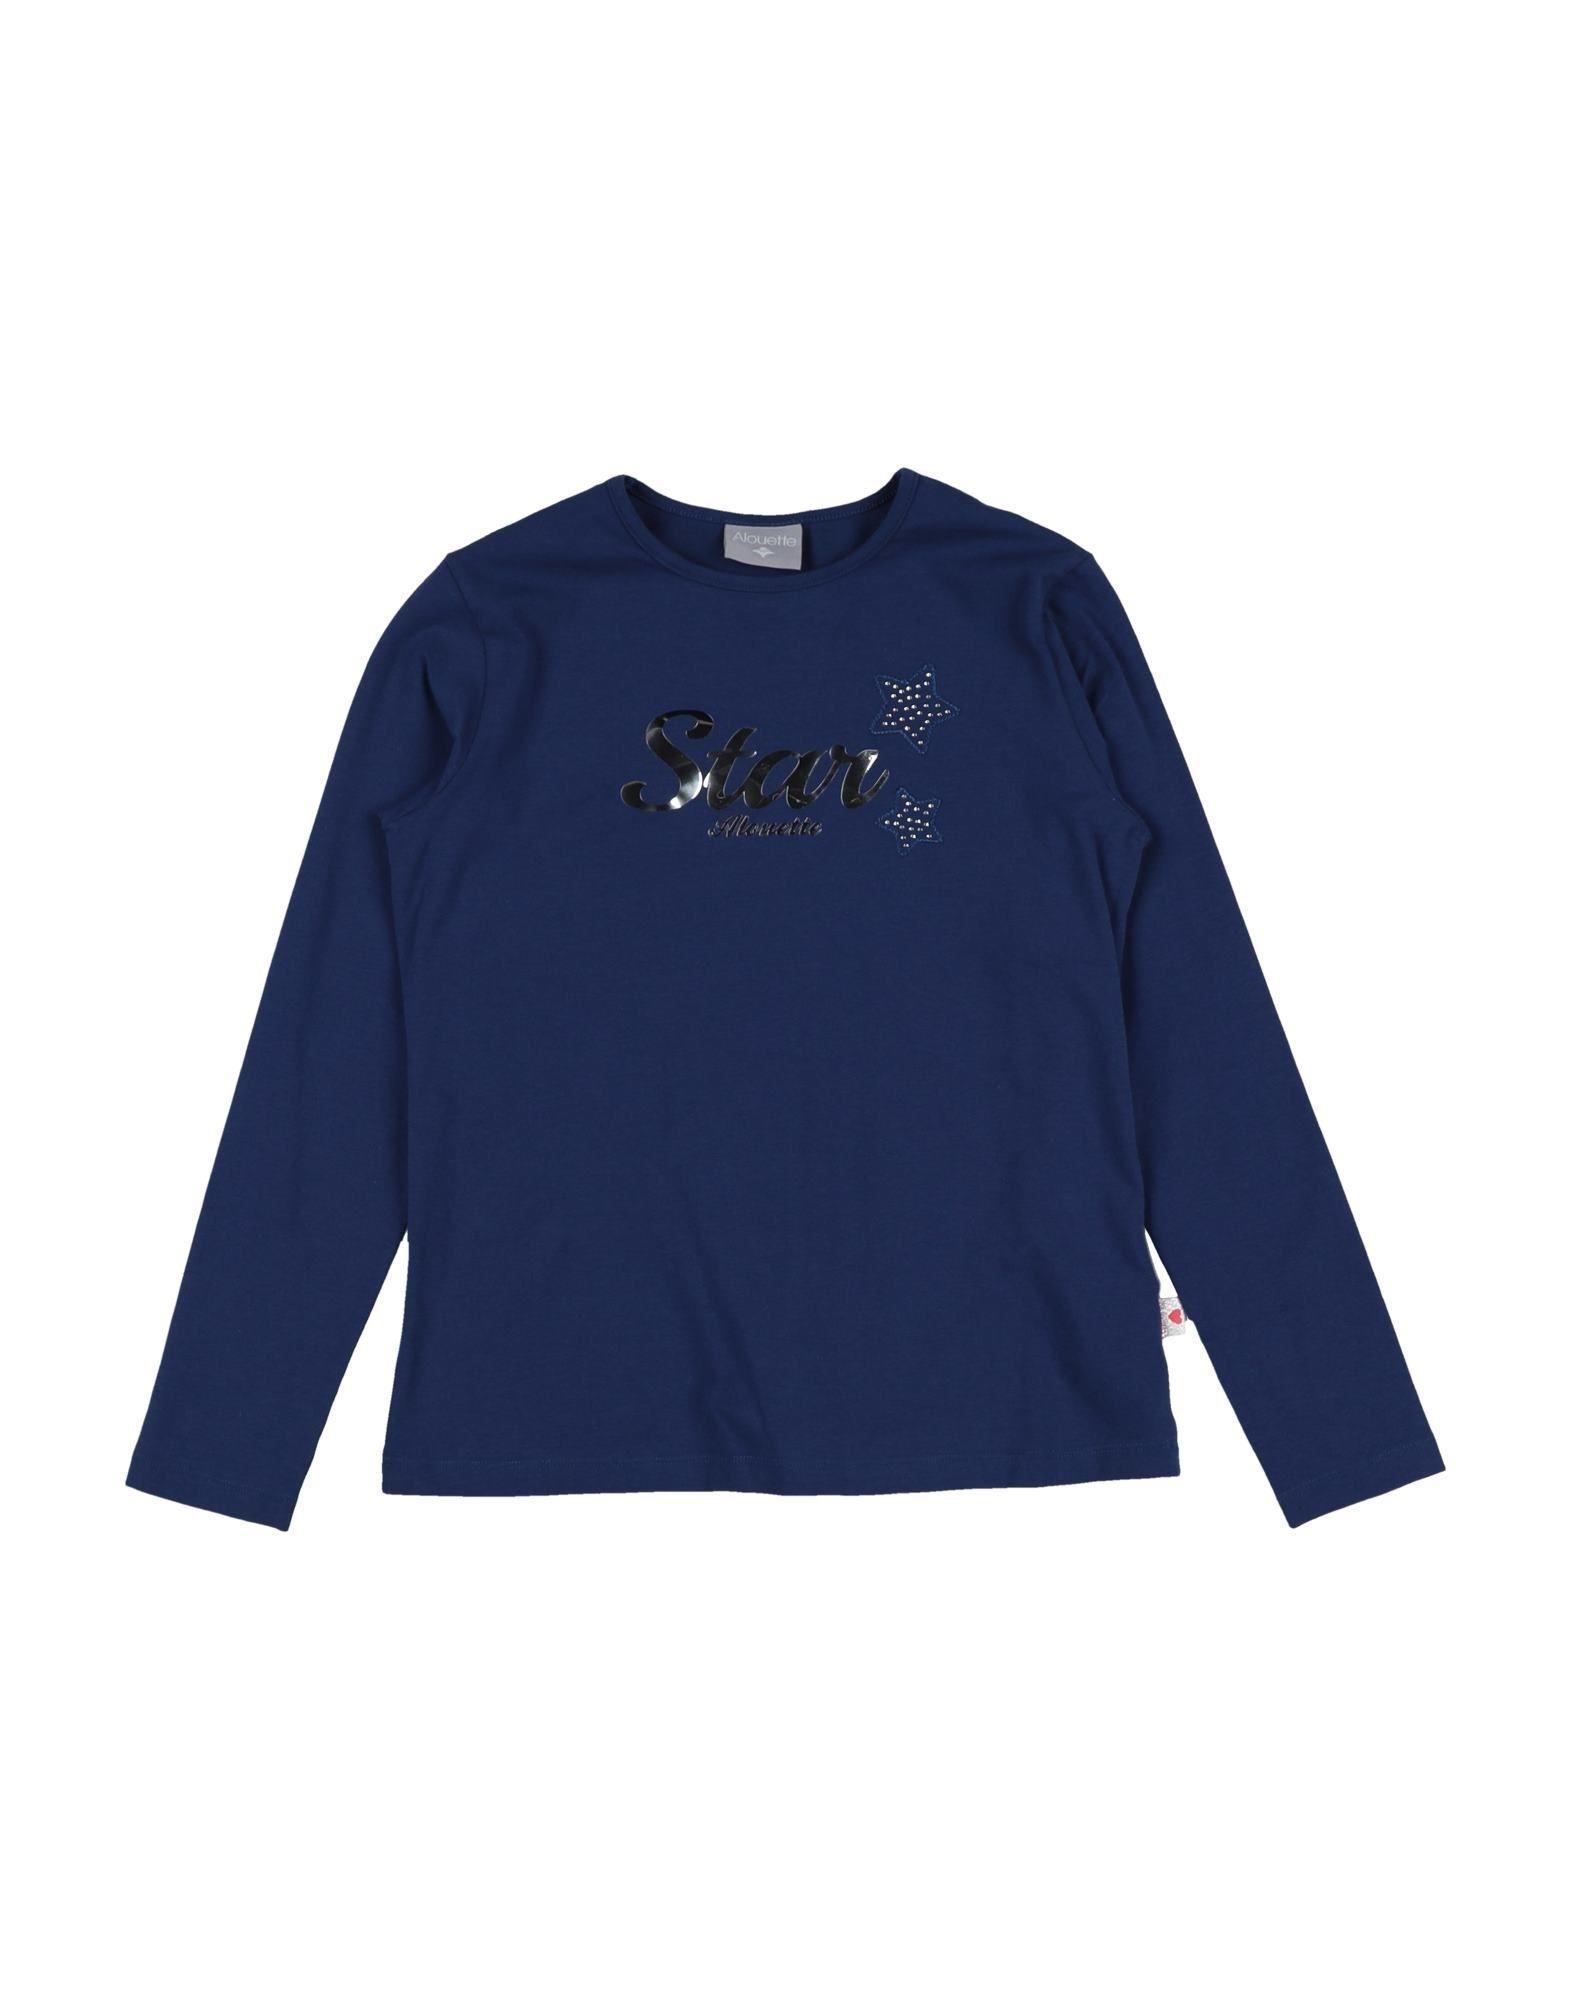 Alouette Kids' T-shirts In Blue